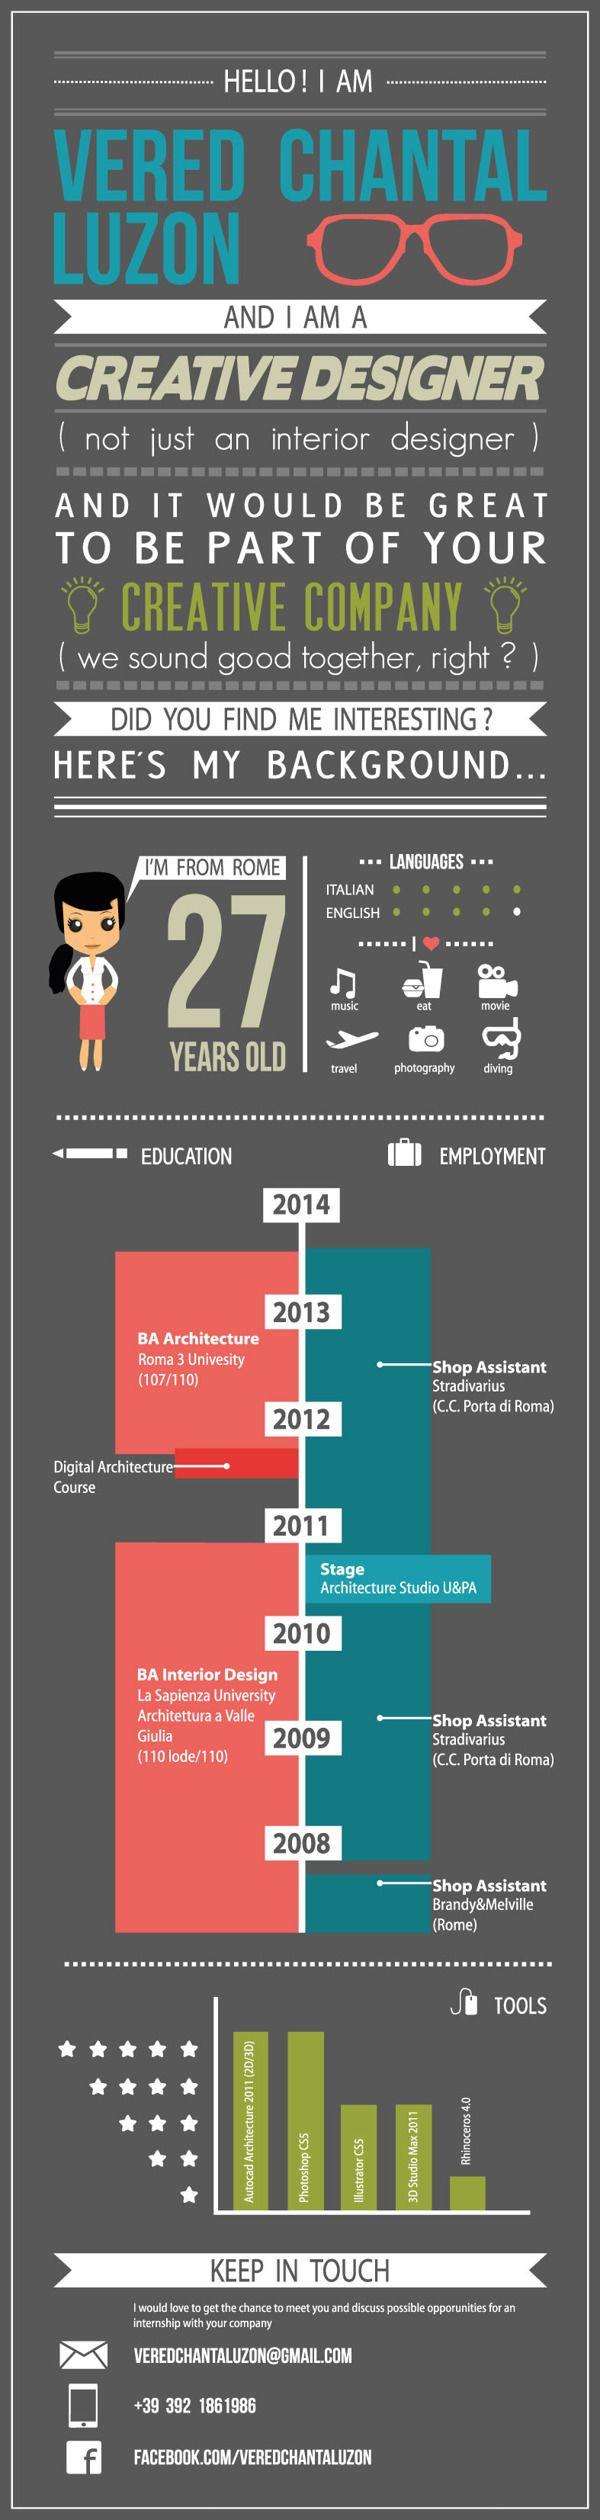 Pin de Louis Vo en CV Infographic   Pinterest